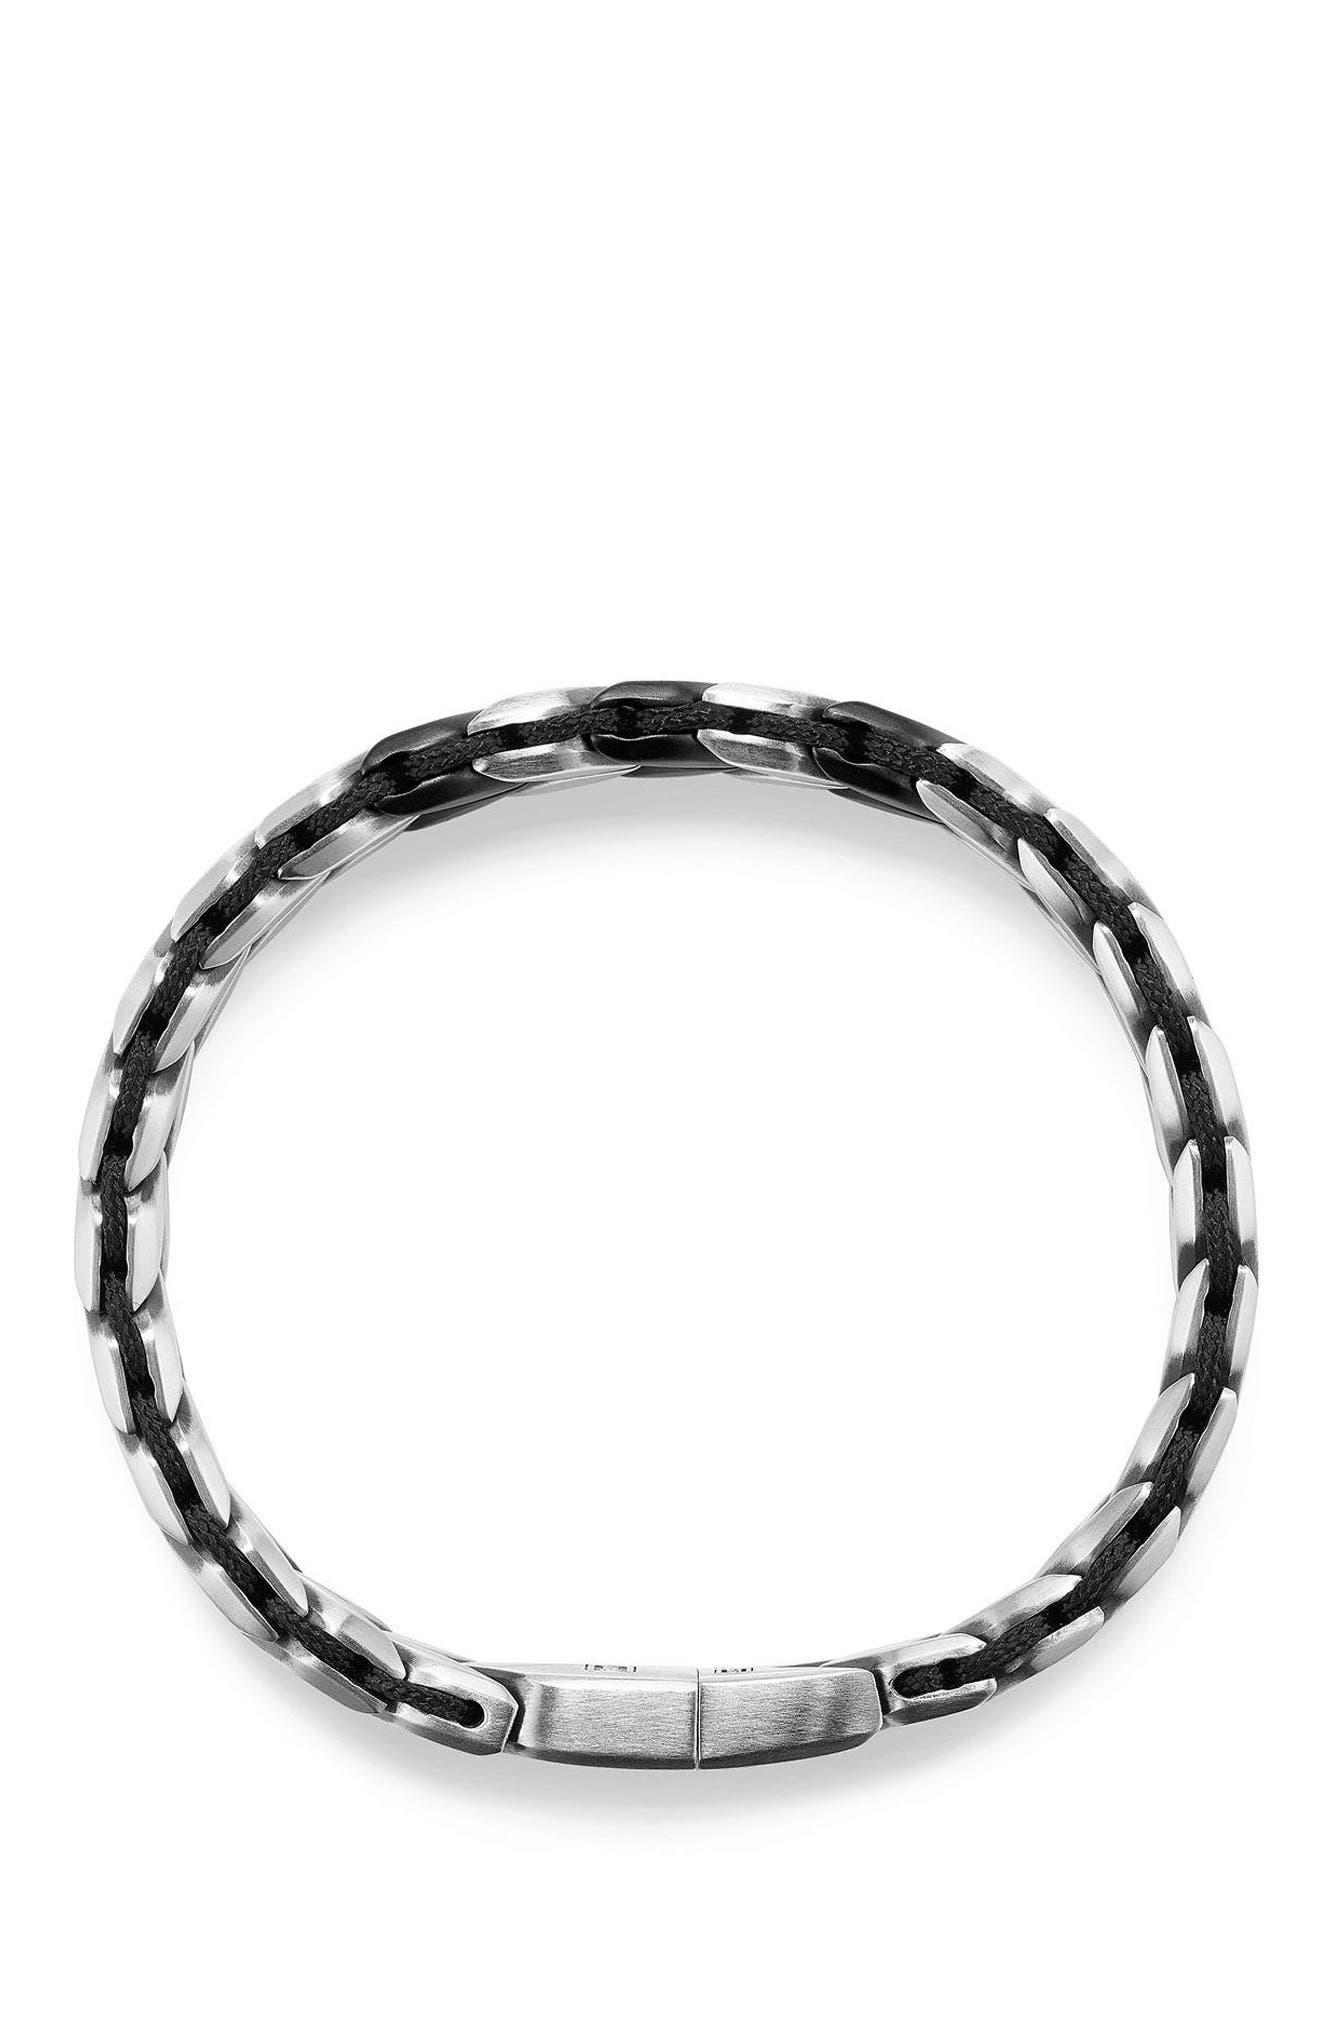 Chevron Woven Bracelet,                             Alternate thumbnail 3, color,                             SILVER/ BLACK TITANIUM